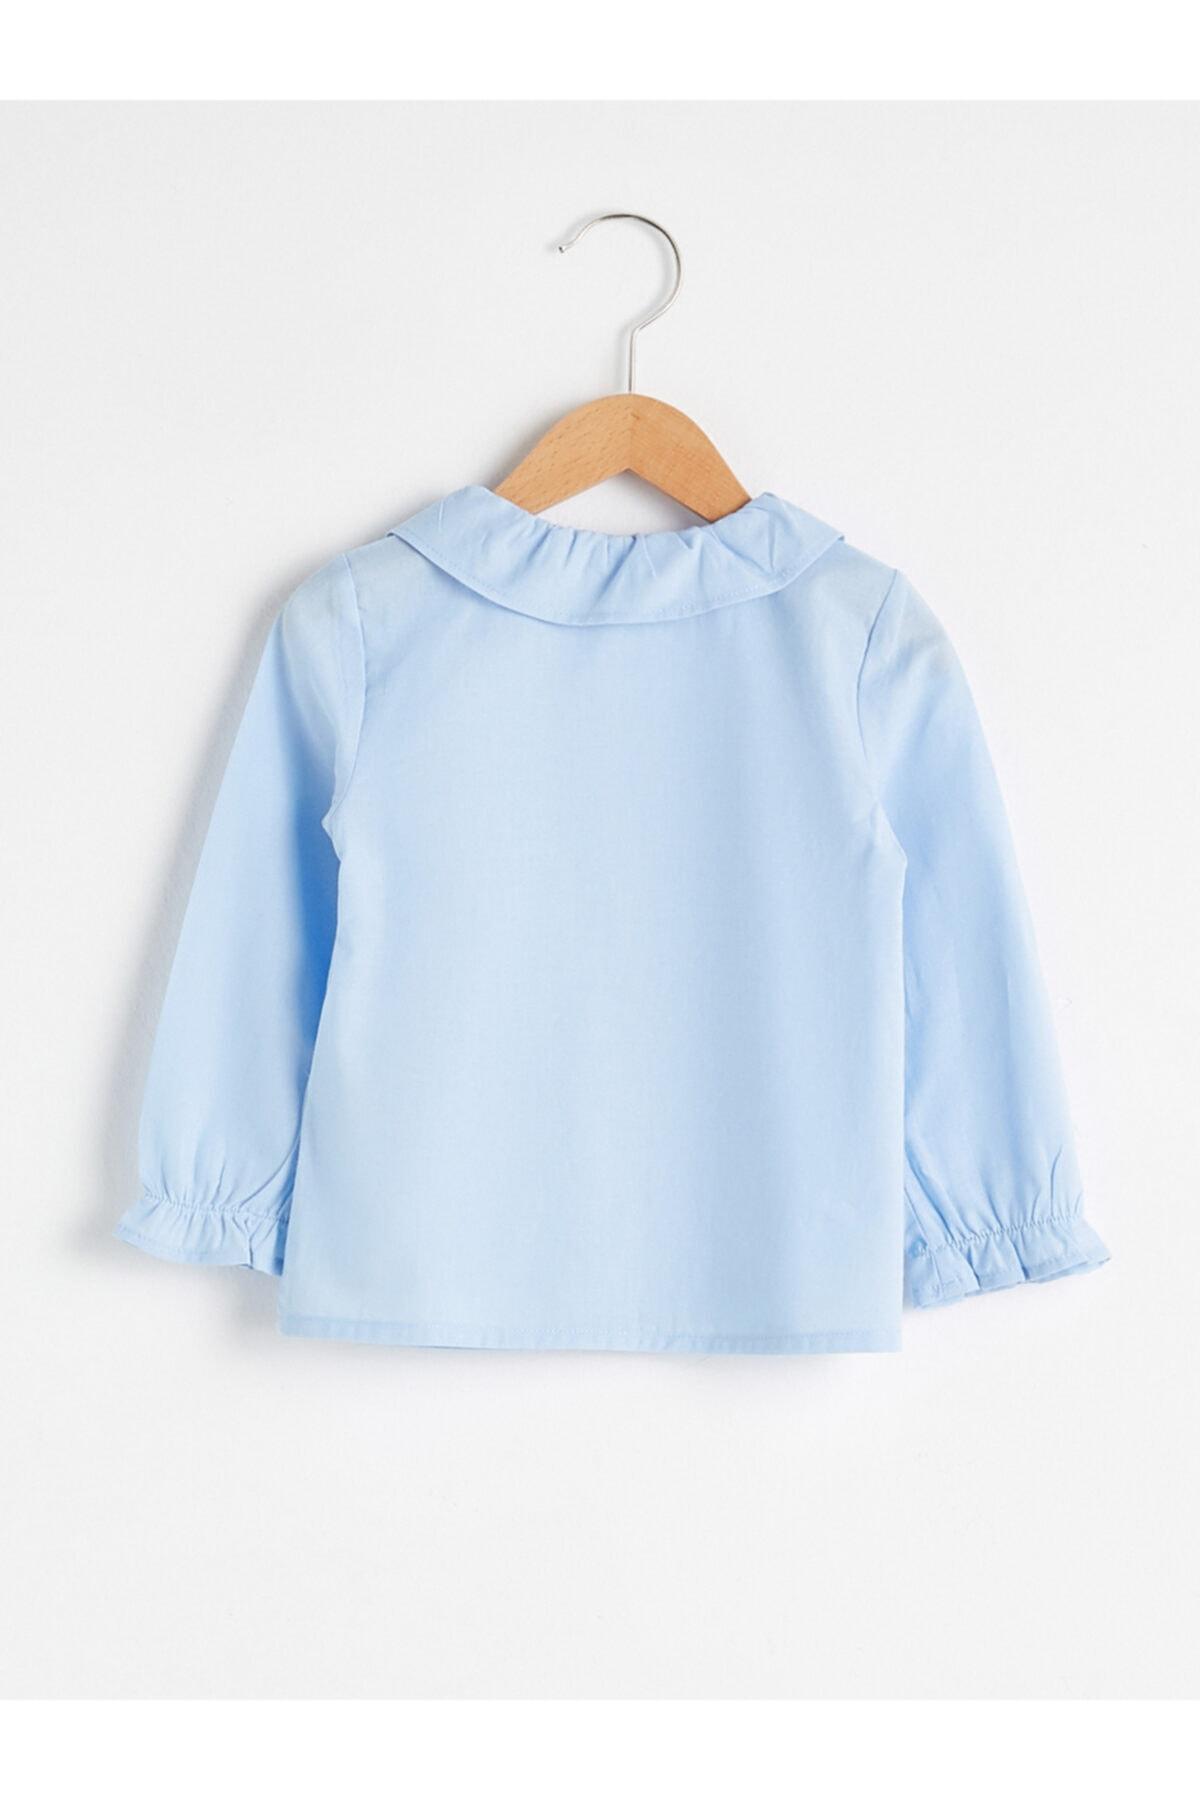 LC Waikiki Kız Bebek Mavi Gömlek 2